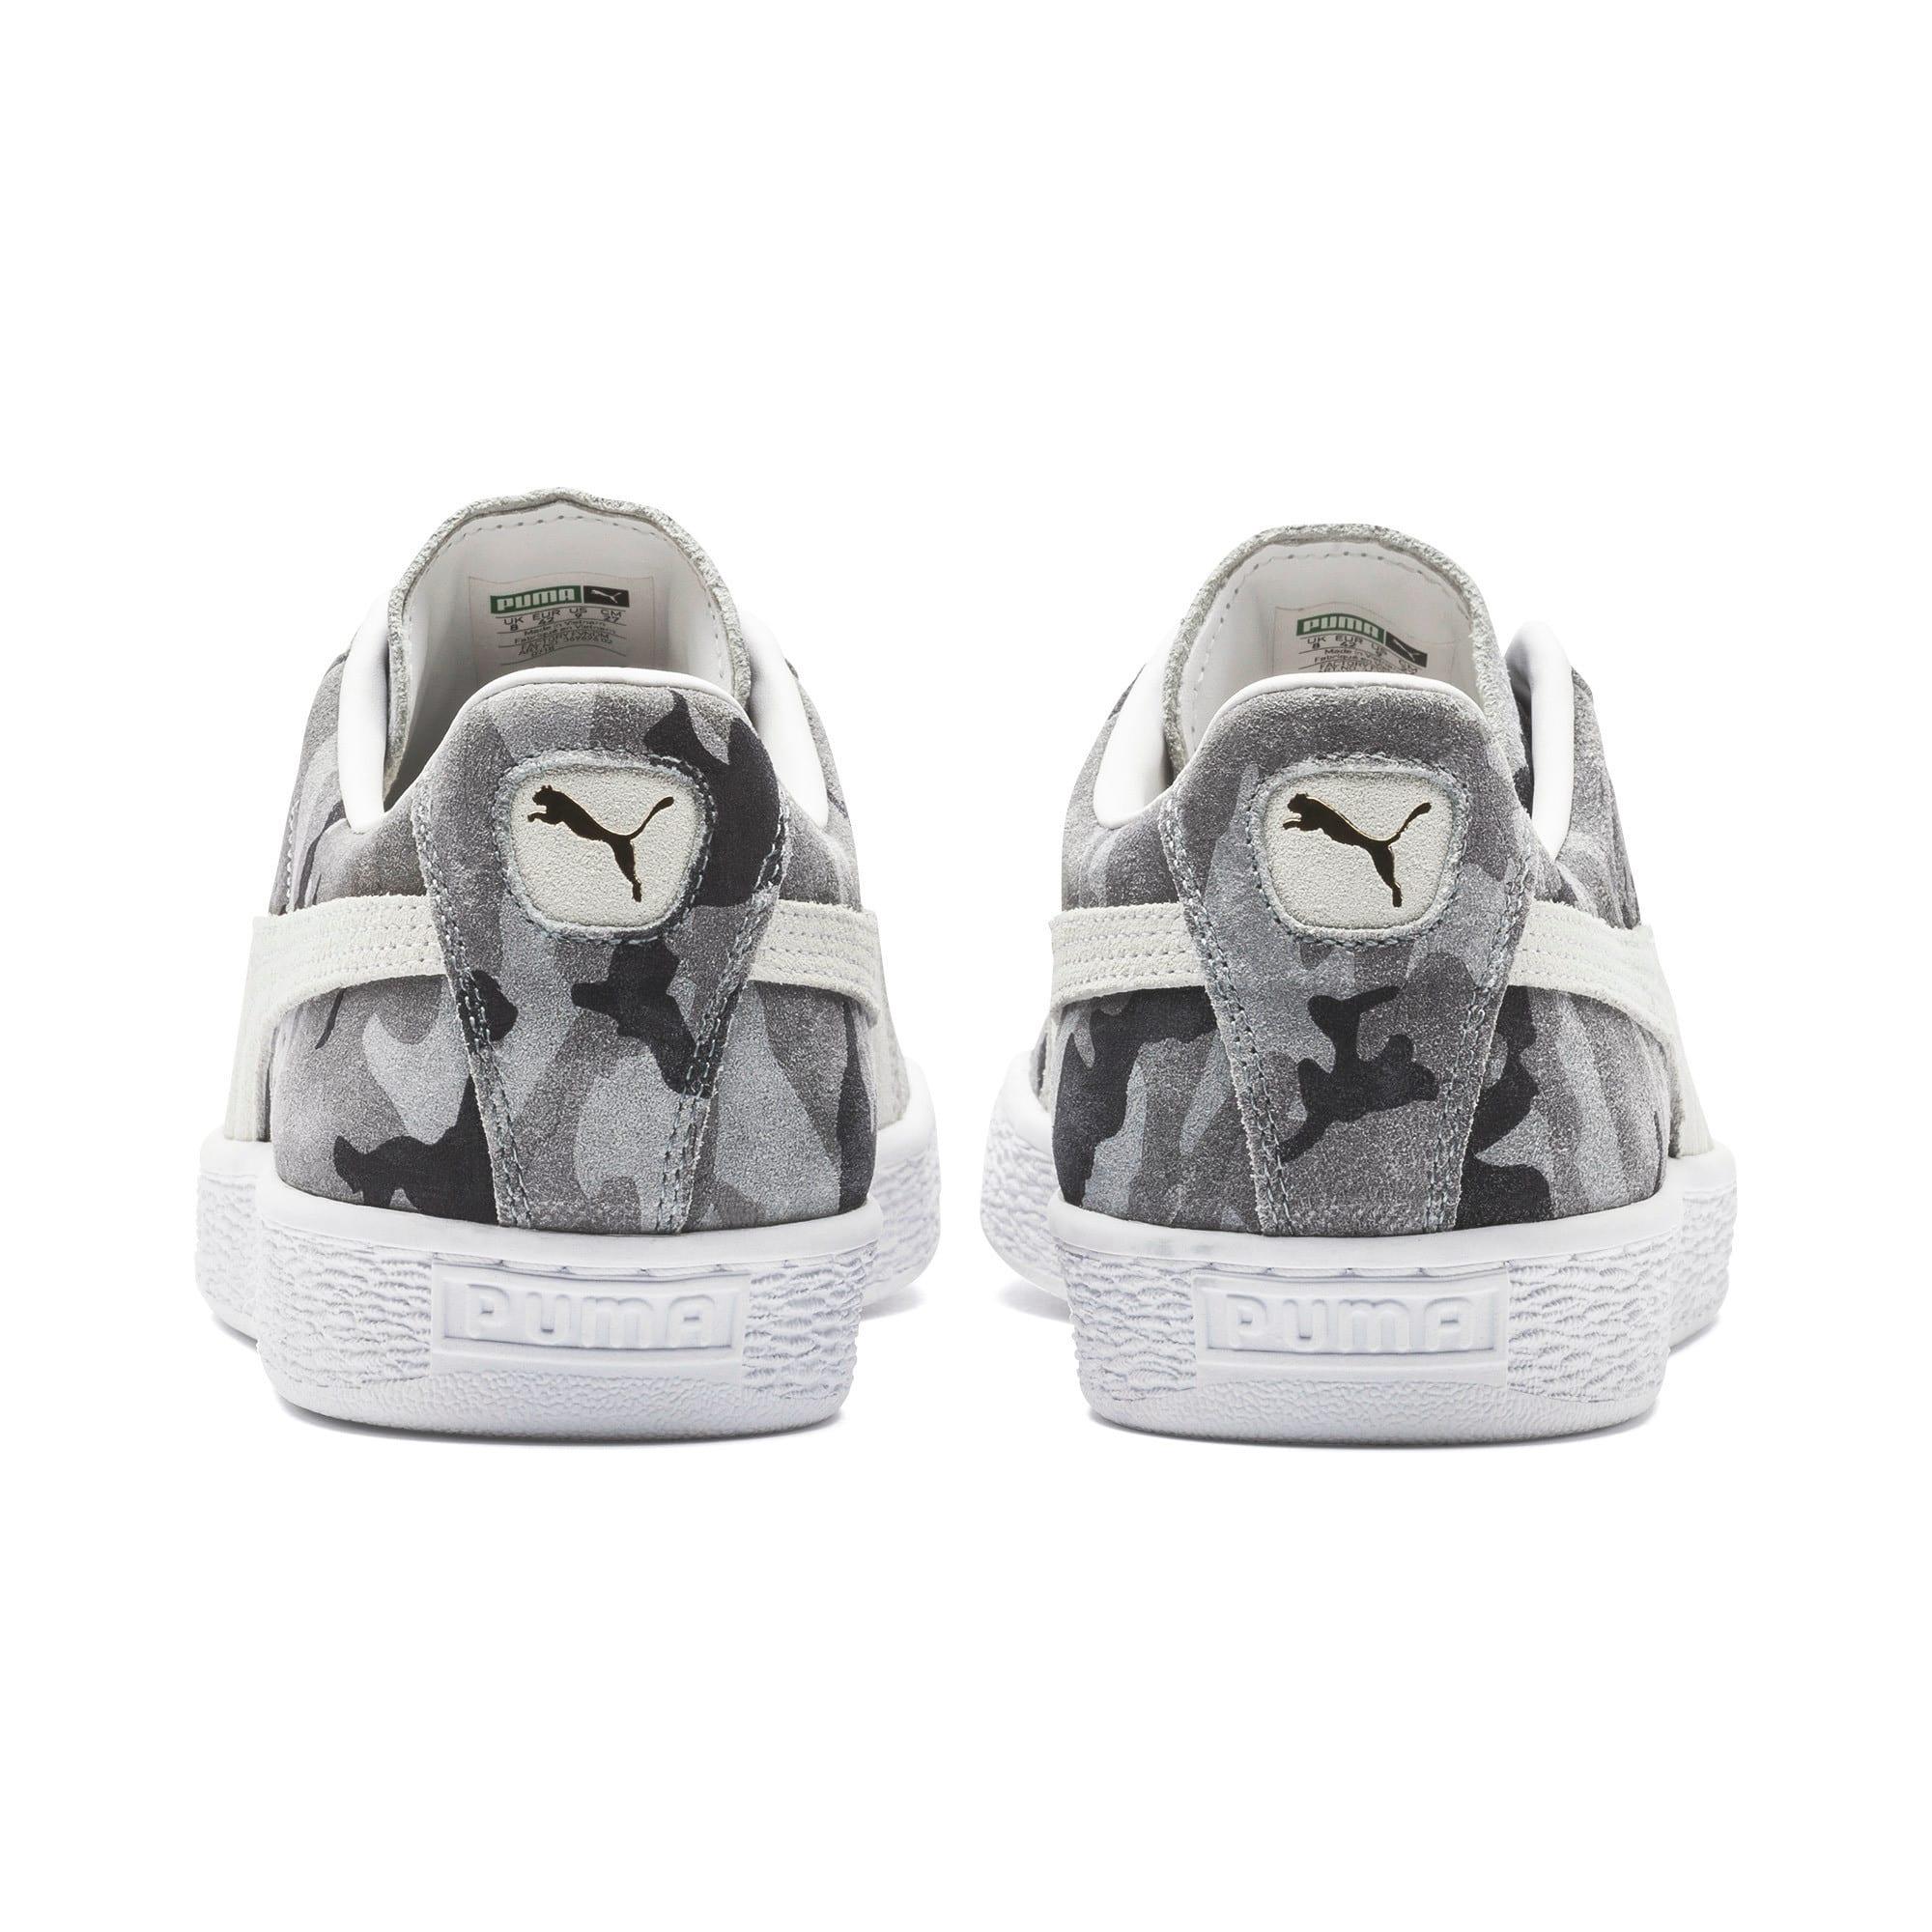 Thumbnail 3 of Suede Classic Ambush Sneakers, Puma Black-CASTLEROCK-White, medium